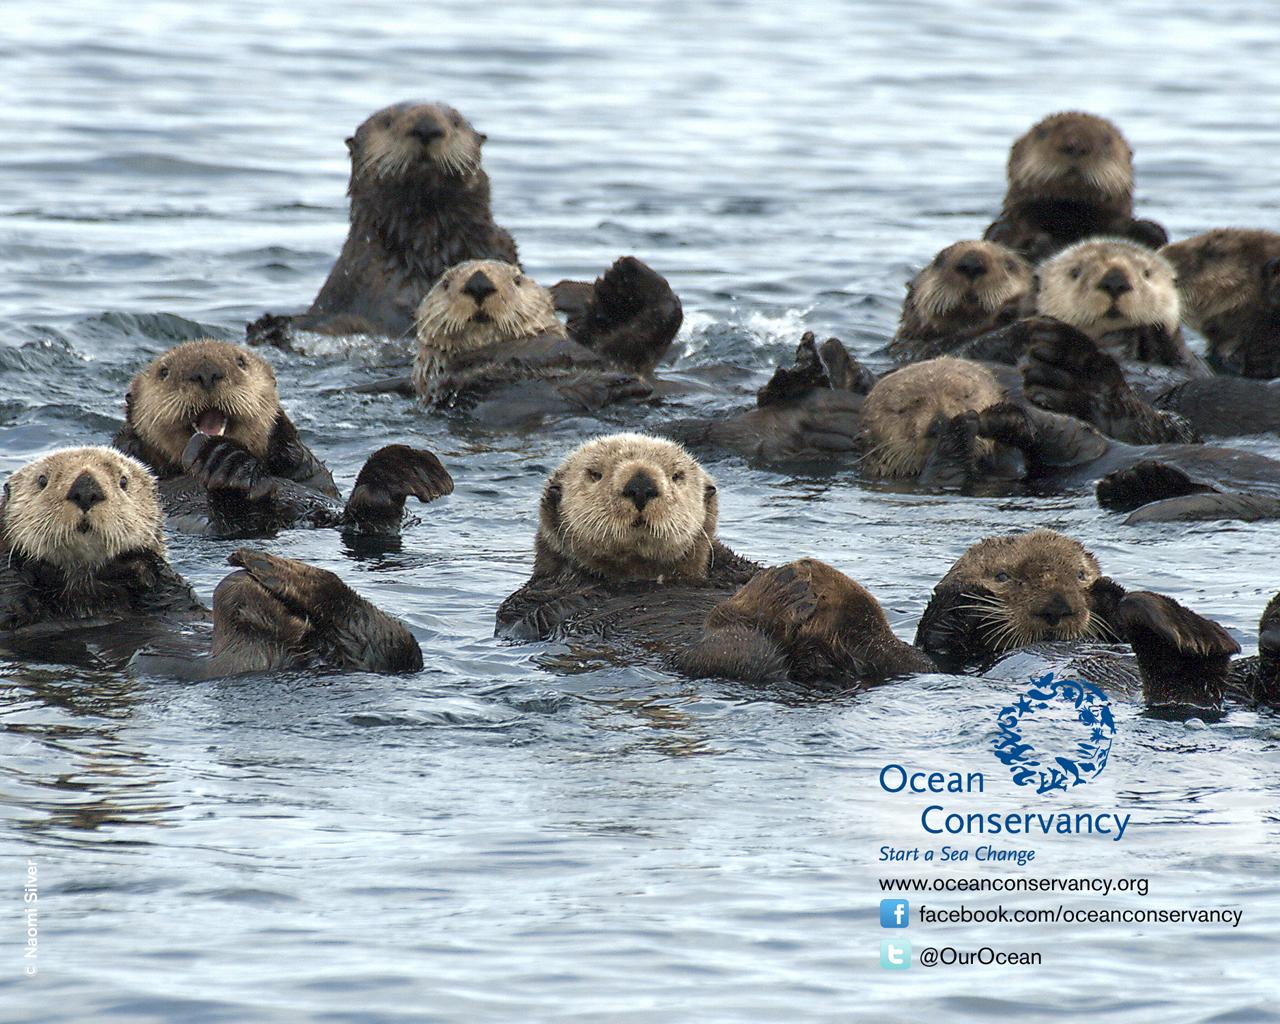 Otter Wallpaper Related Keywords Suggestions   Otter Wallpaper Long 1280x1024